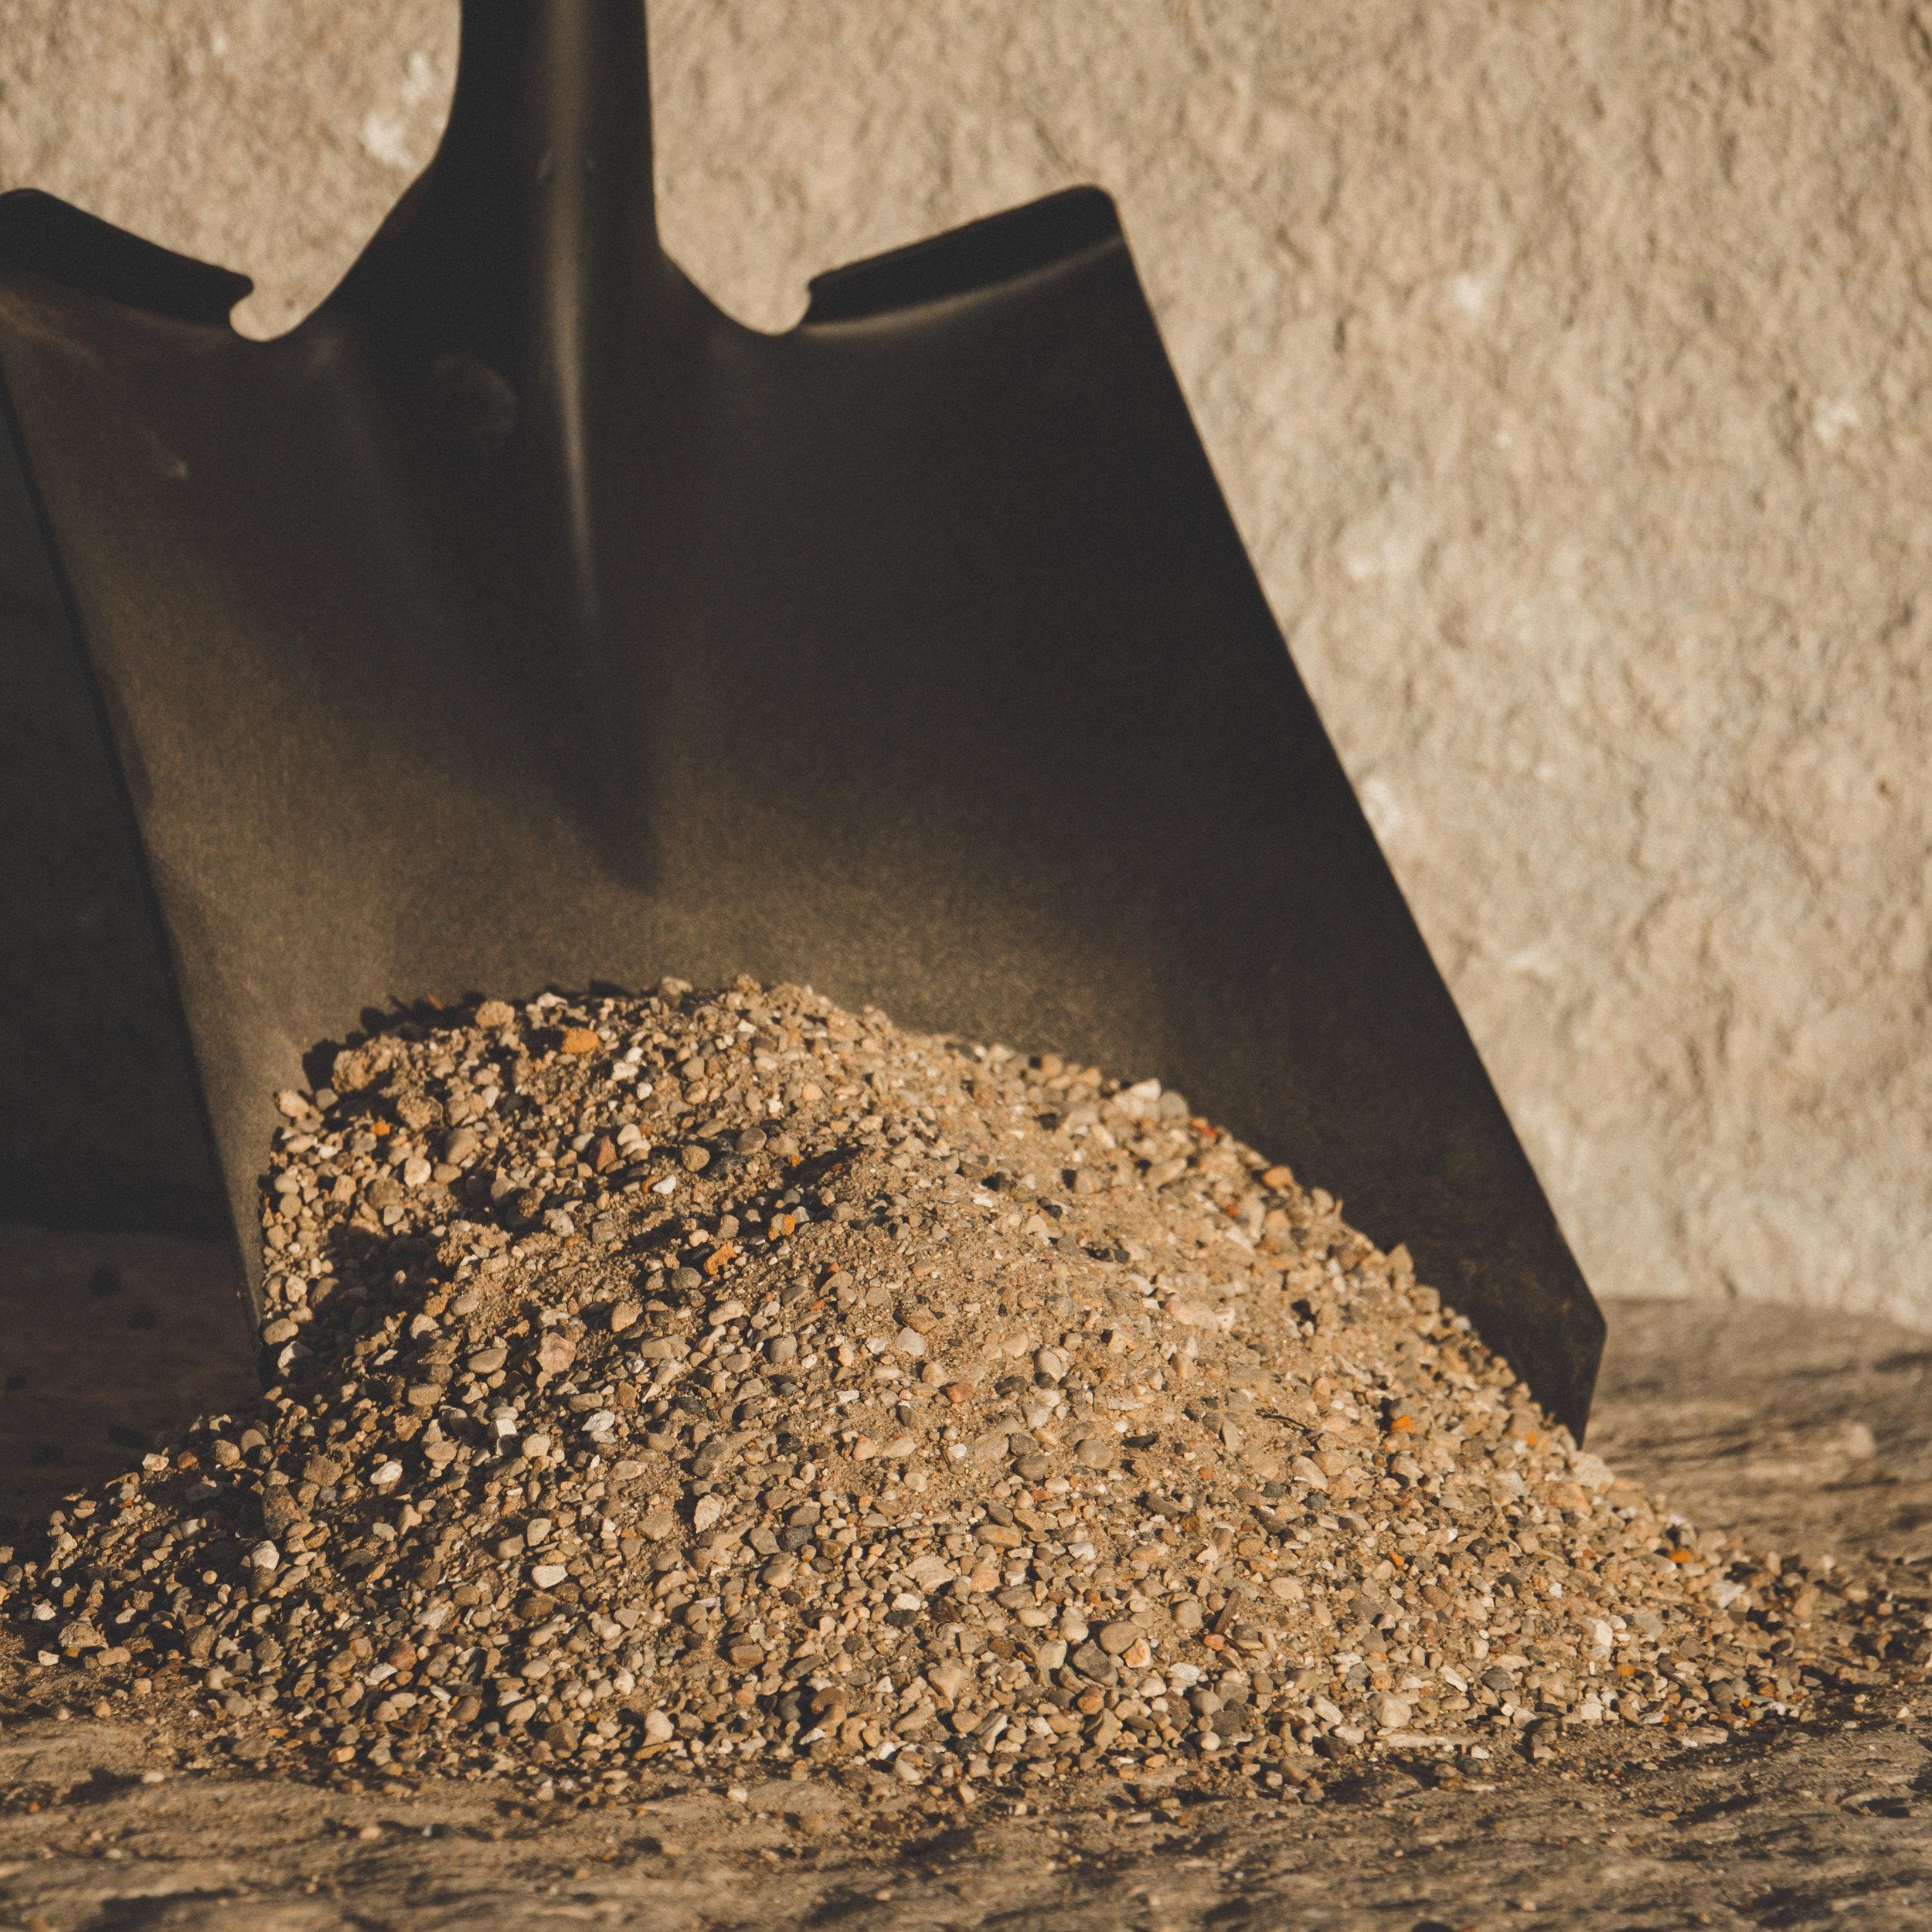 Torpedo Sand - Primarily used under bricks when creating patios.